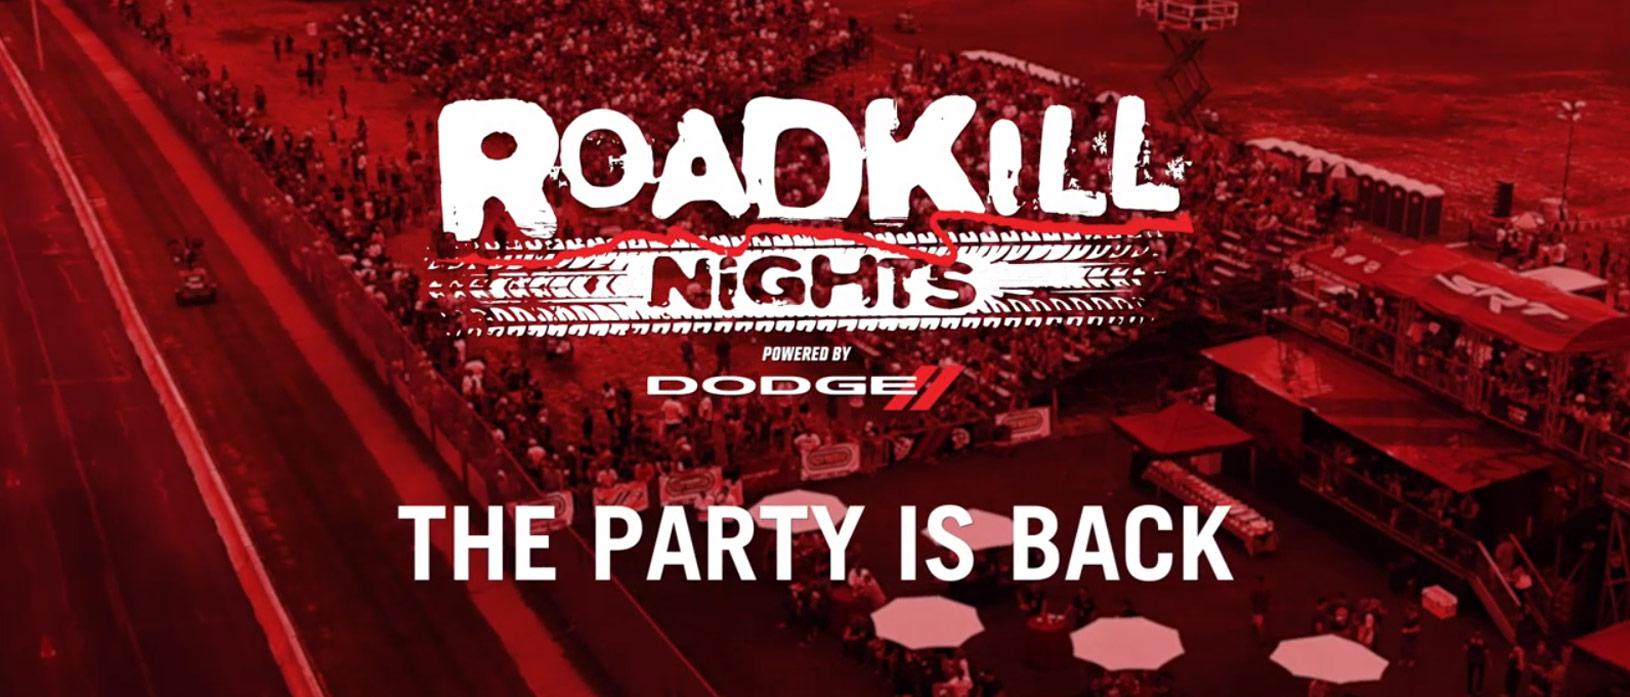 Roadkill Nights is Back